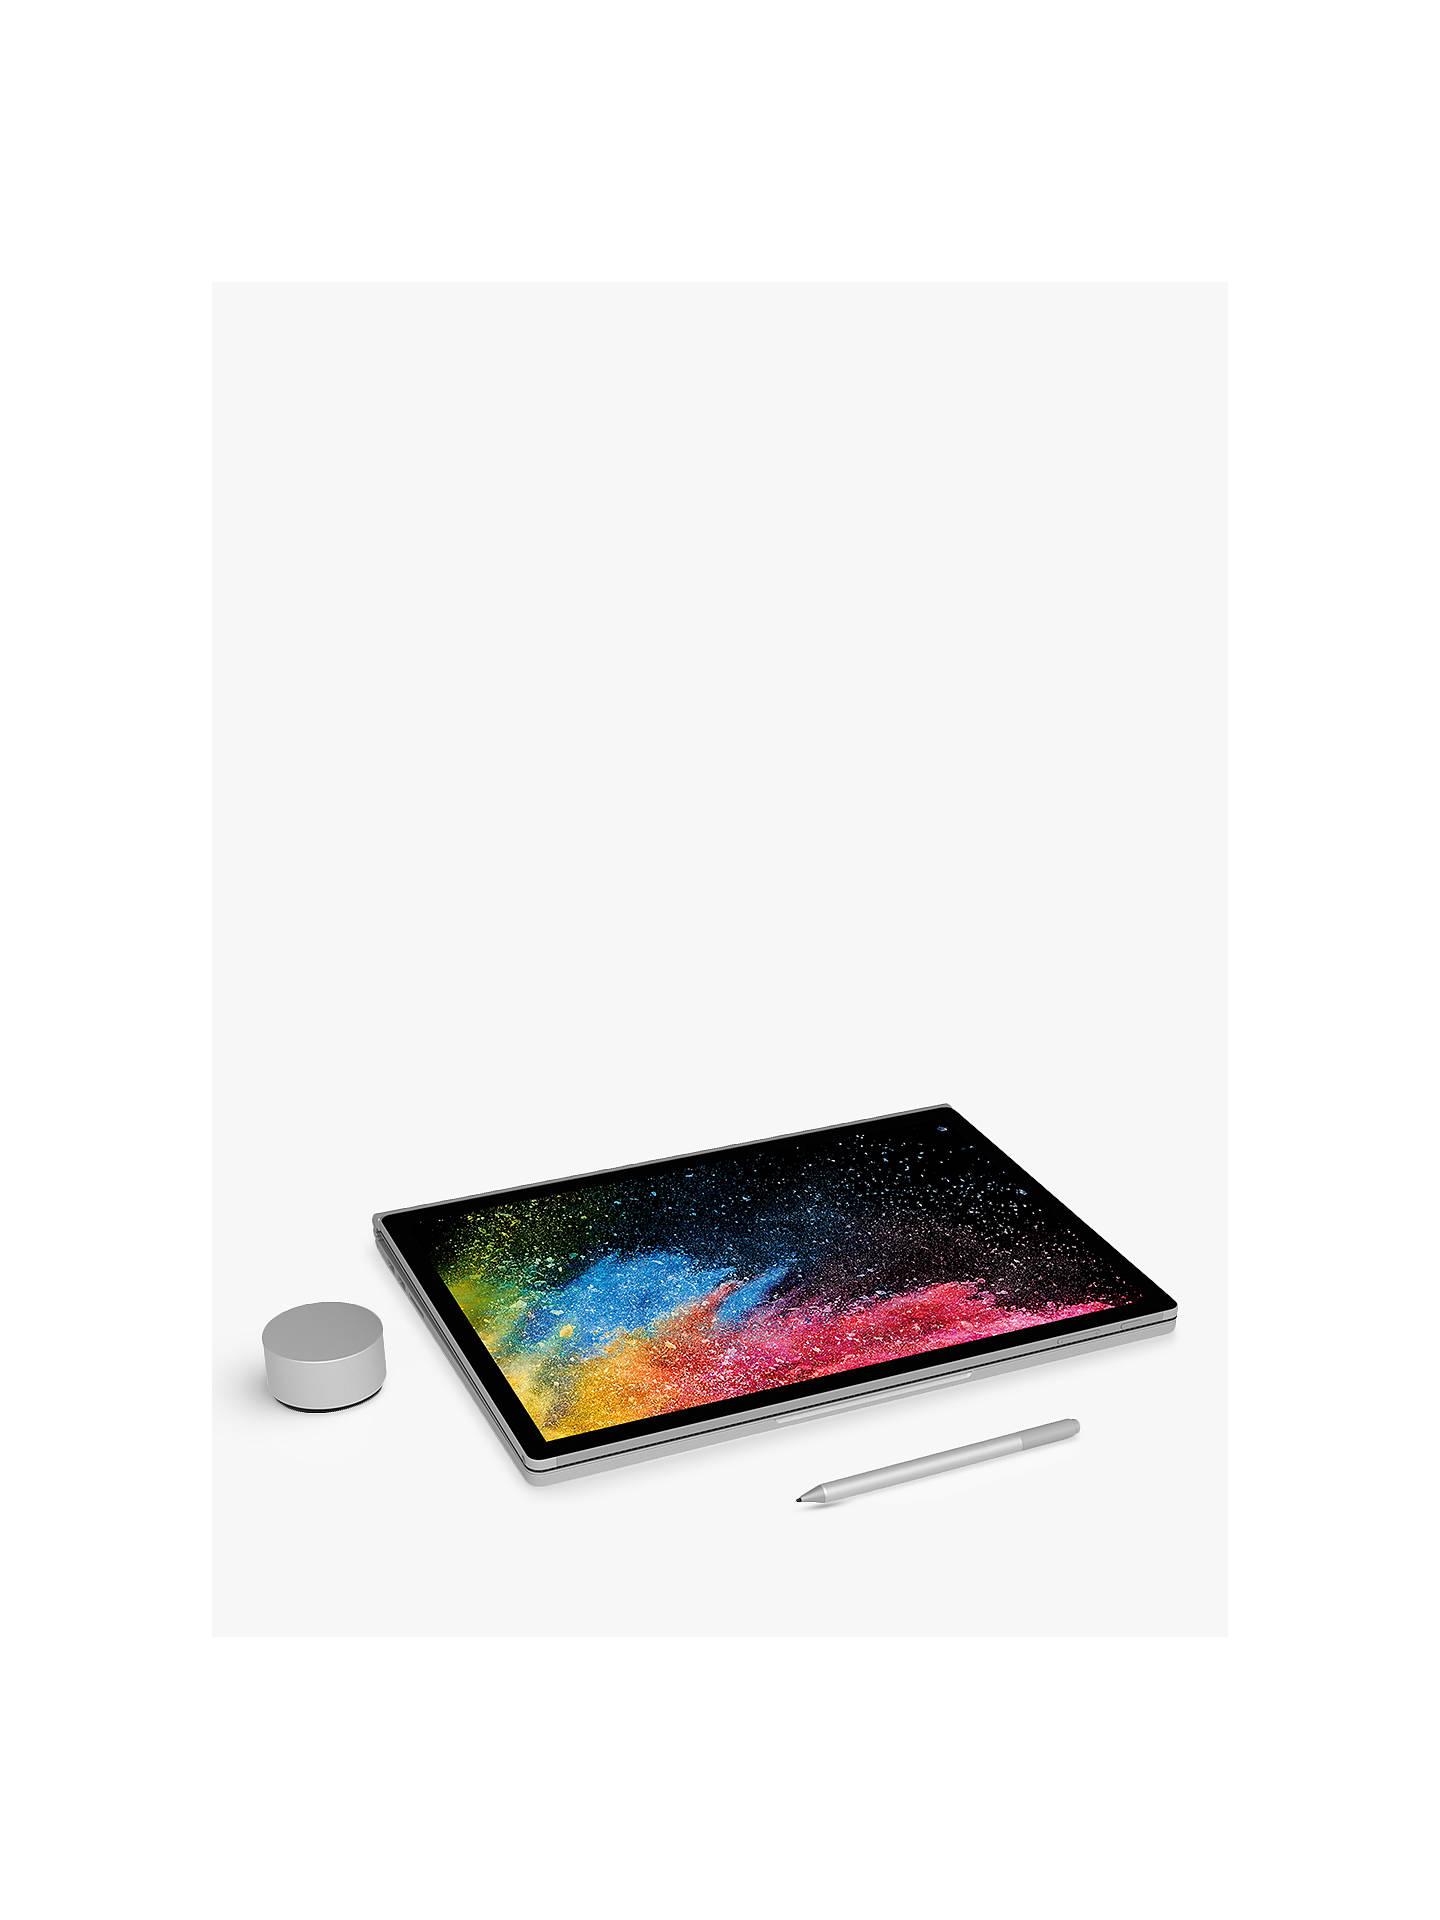 "Microsoft Surface Book 2, Intel Core i7, 16GB RAM, 256GB SSD, 15"",  PixelSense Display, GeForce GTX 1060, Silver"